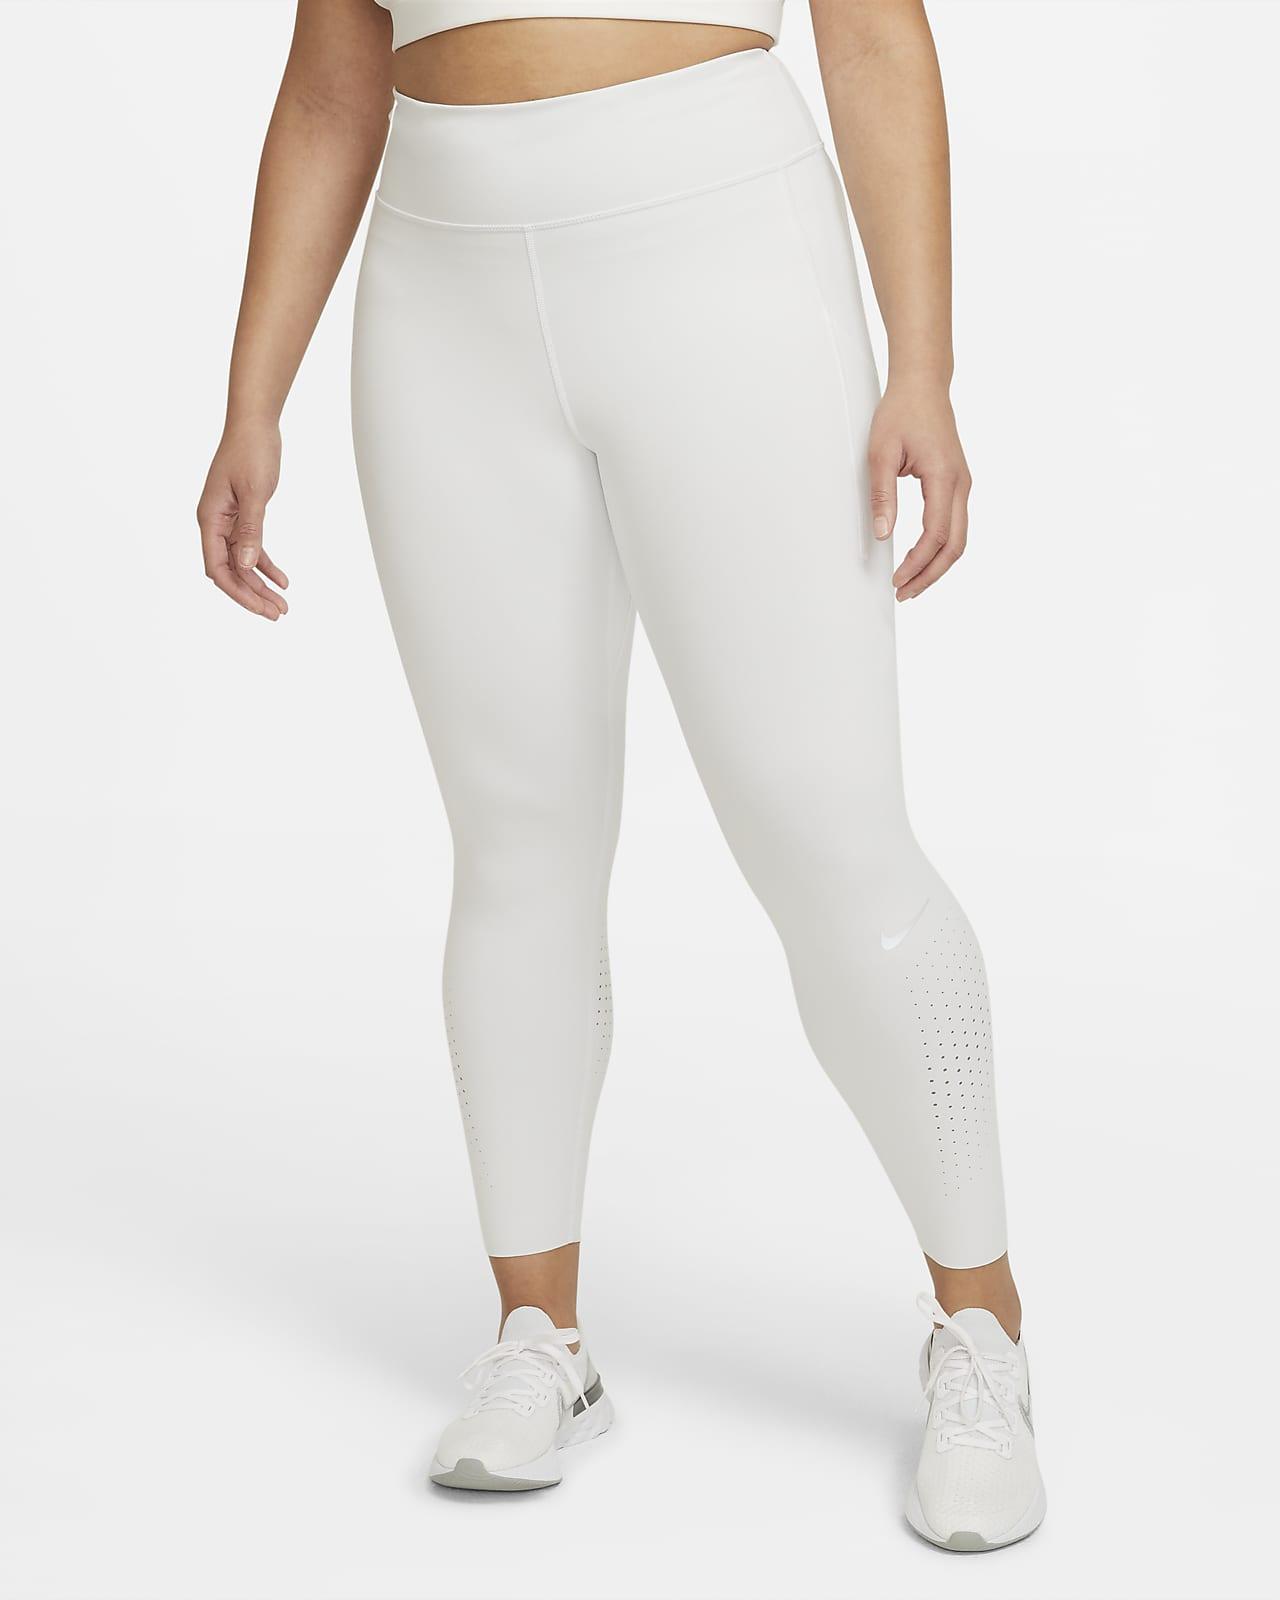 Nike Epic Luxe Women's Mid-Rise Pocket Running Leggings (Plus Size)